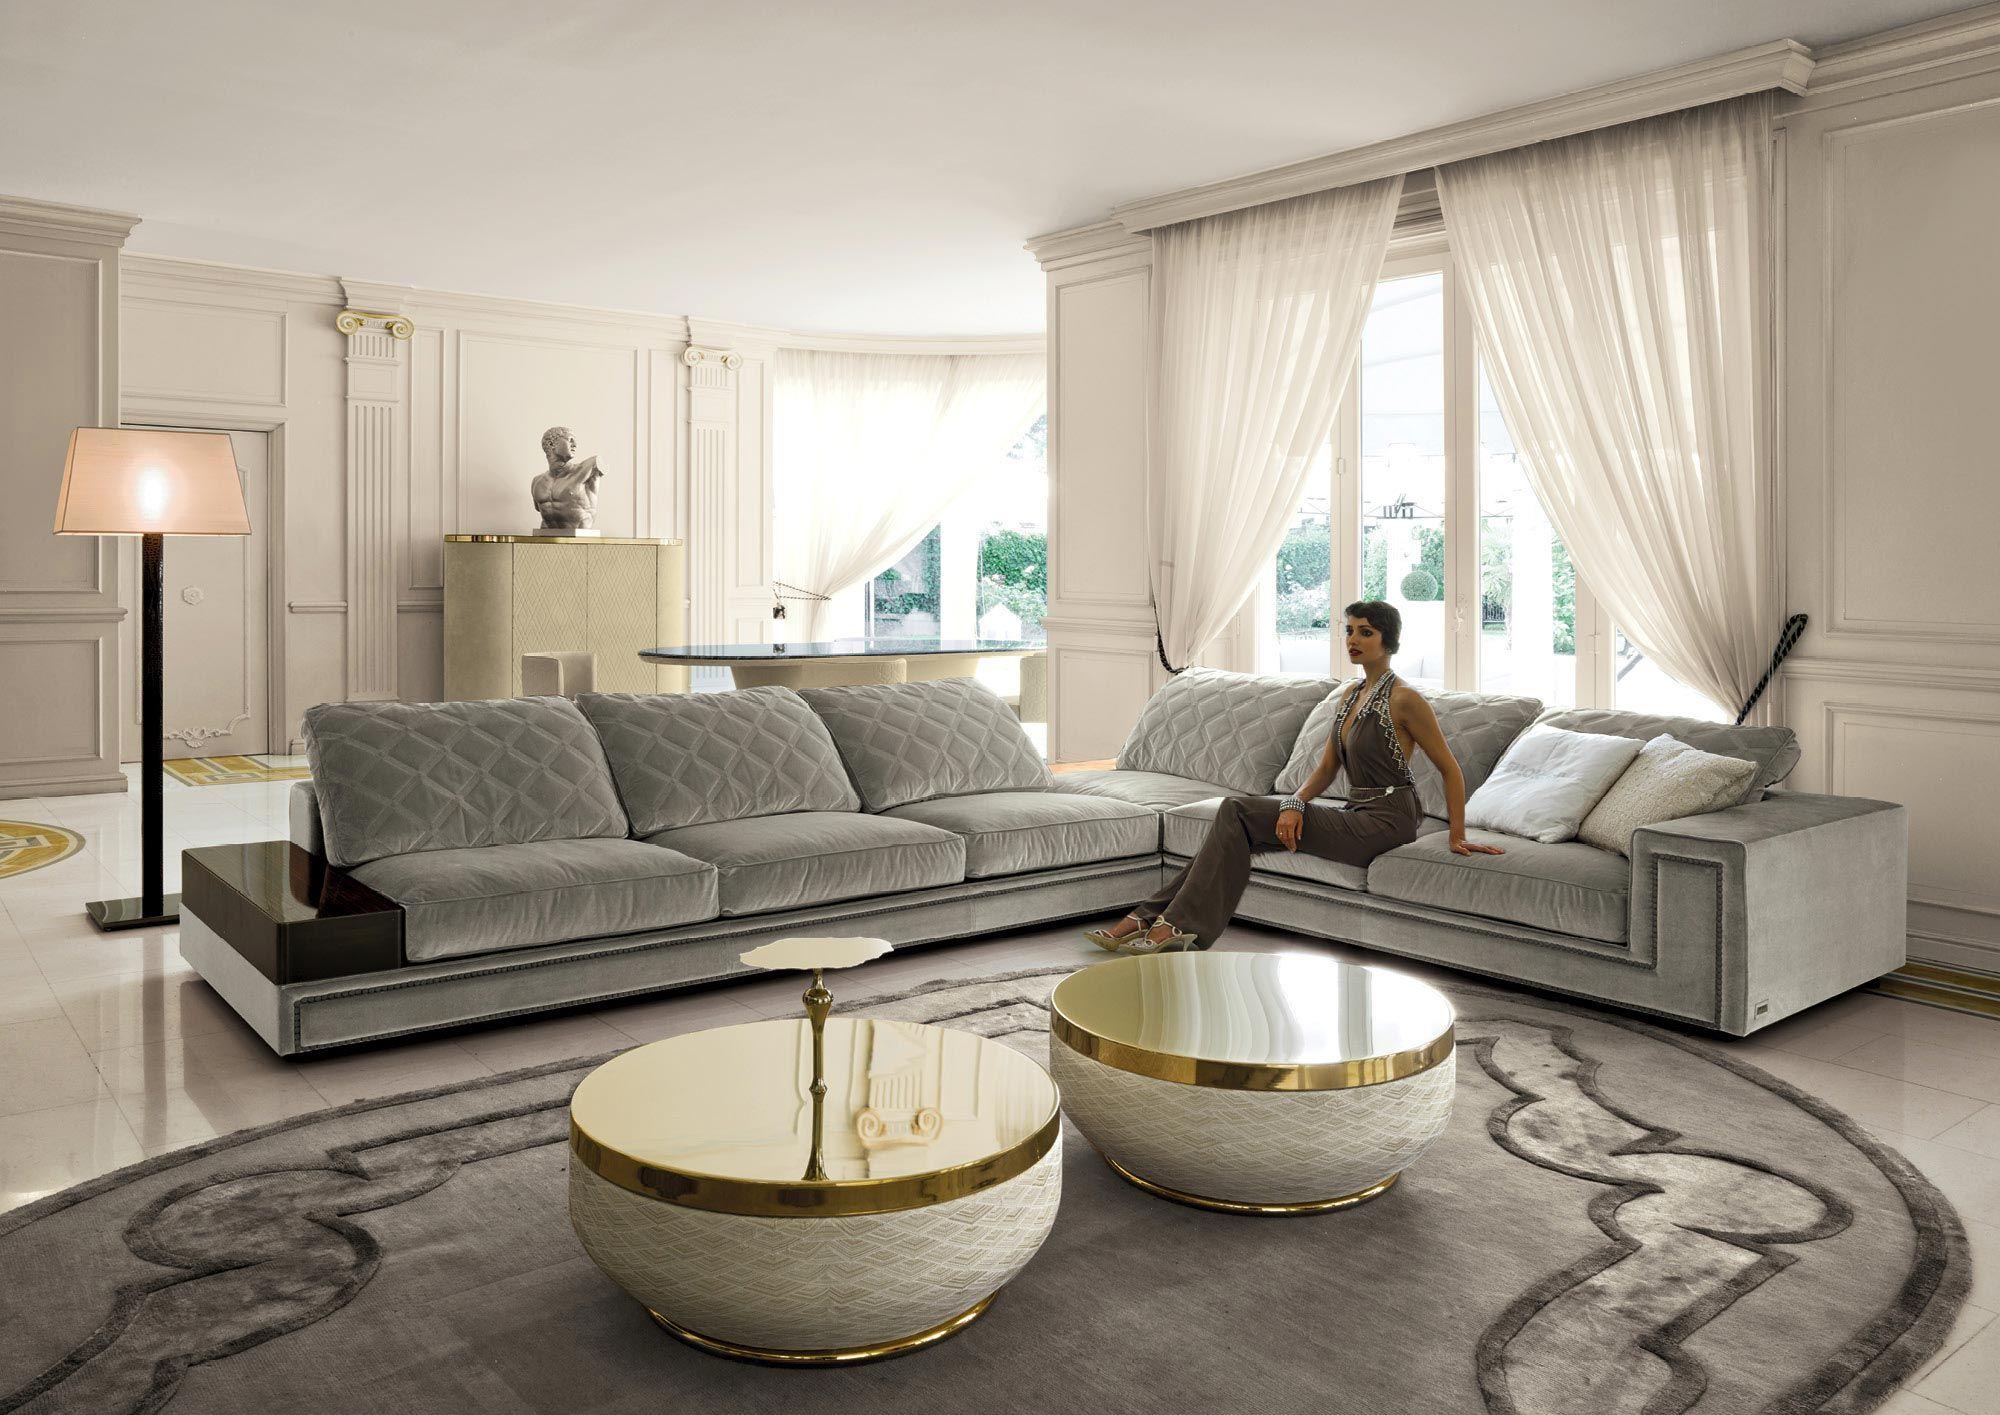 213132 Luxury Italian Furniture Sofa Design Italian Furniture